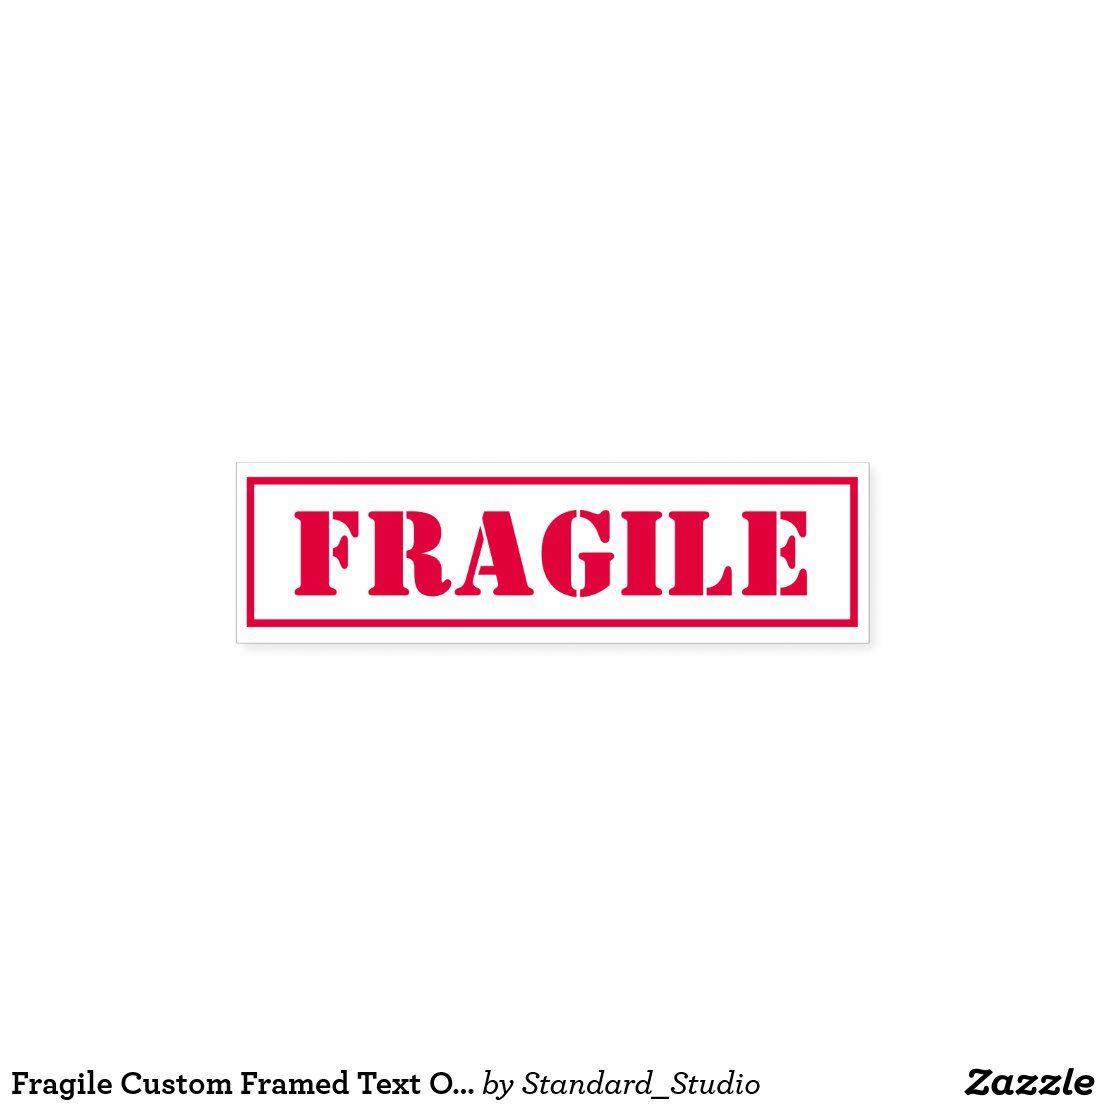 Fragile Custom Framed Text Office Self Inking Stamp Zazzle Com Self Inking Stamps Custom Framing Custom